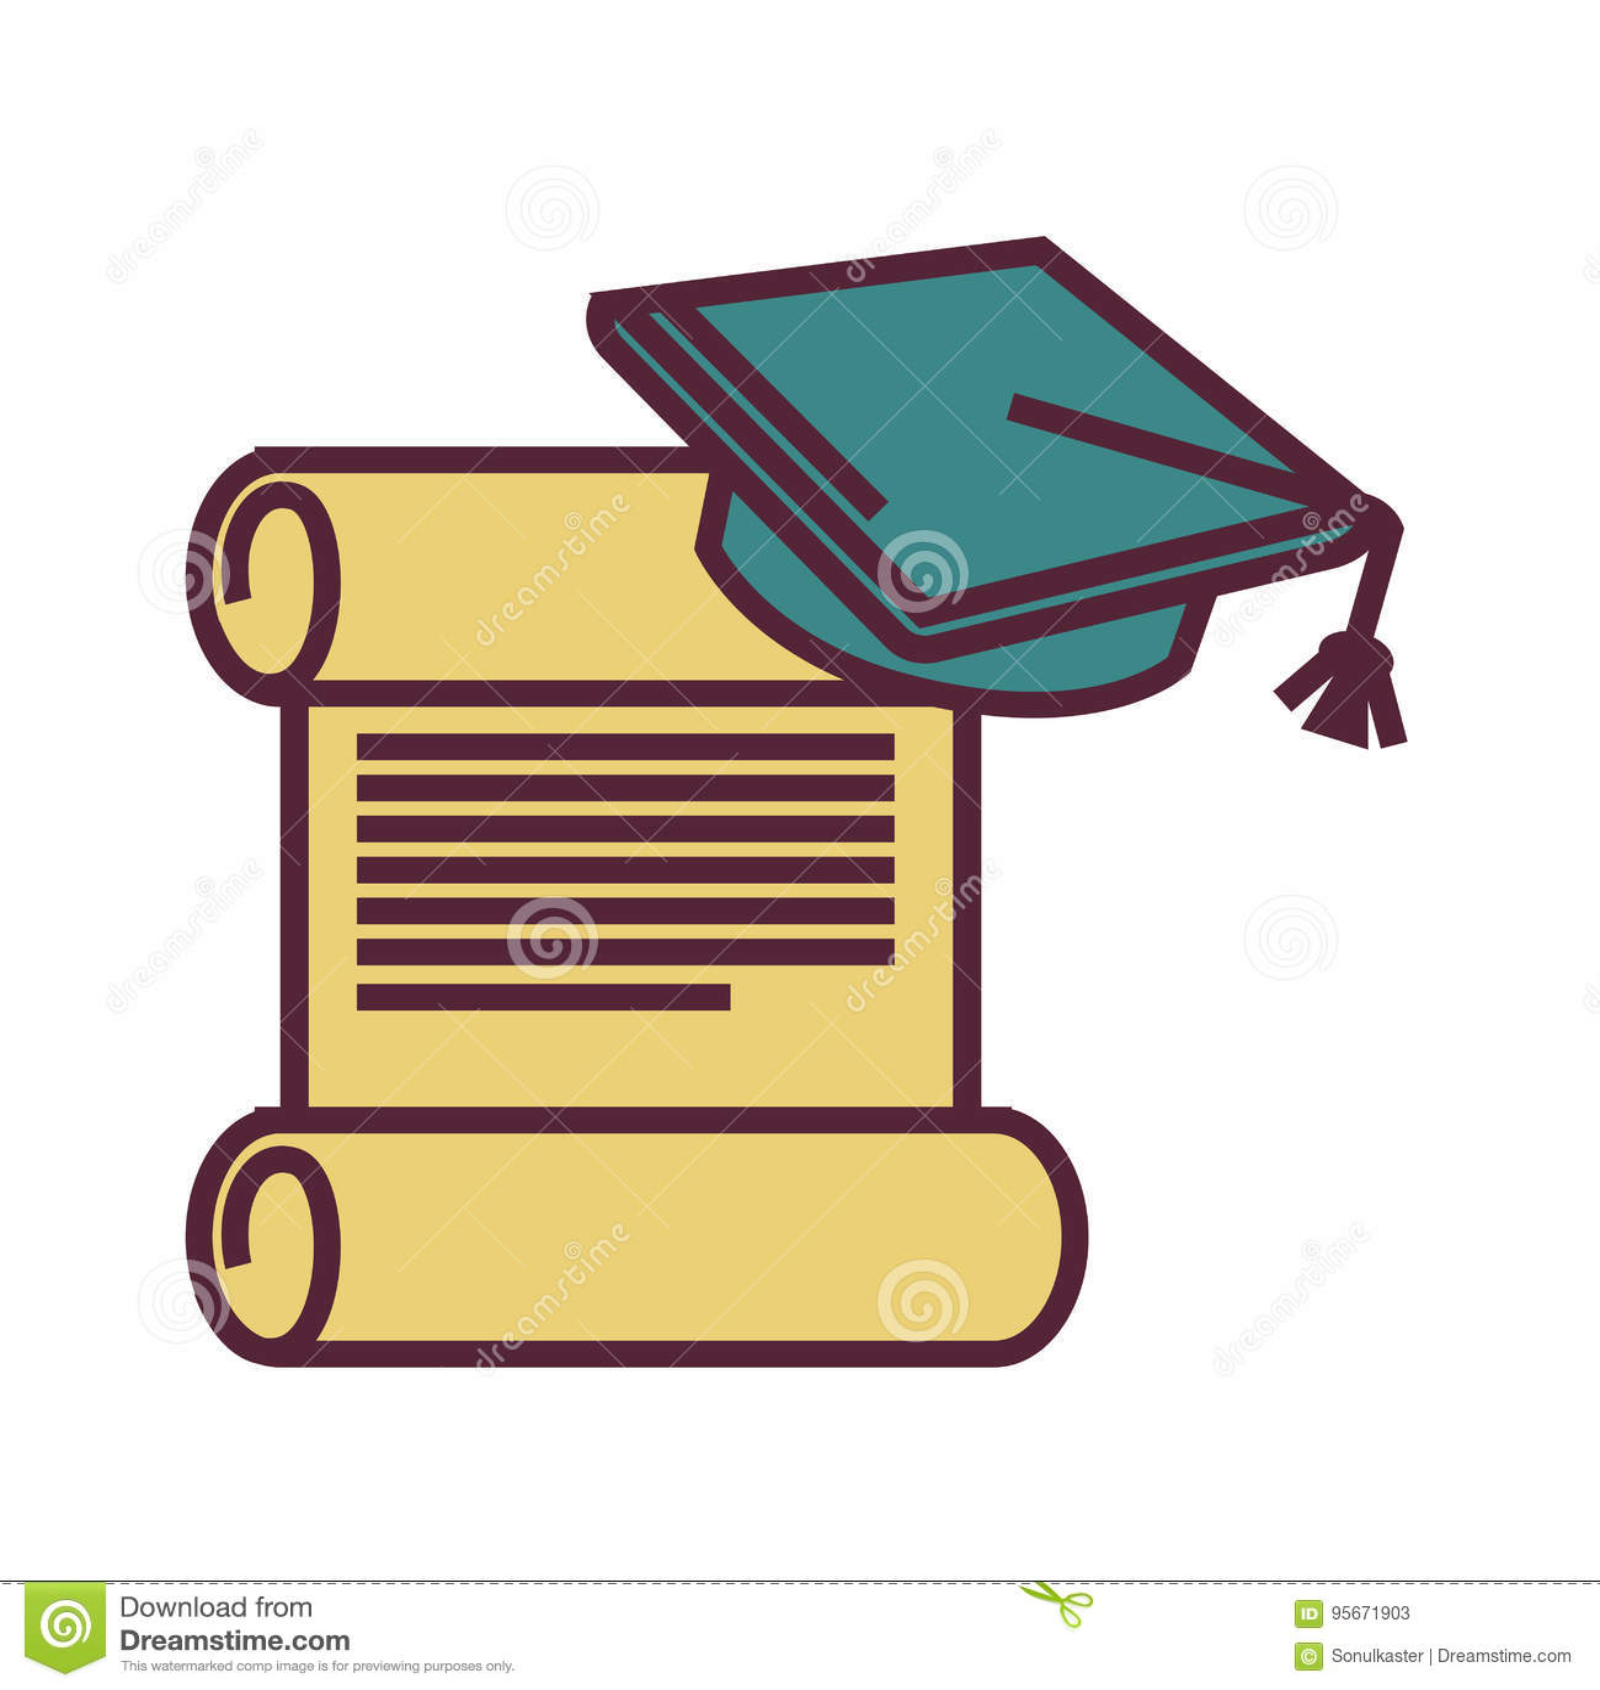 Graduation Symbols Old Parchment And Square Academic Cap Stock